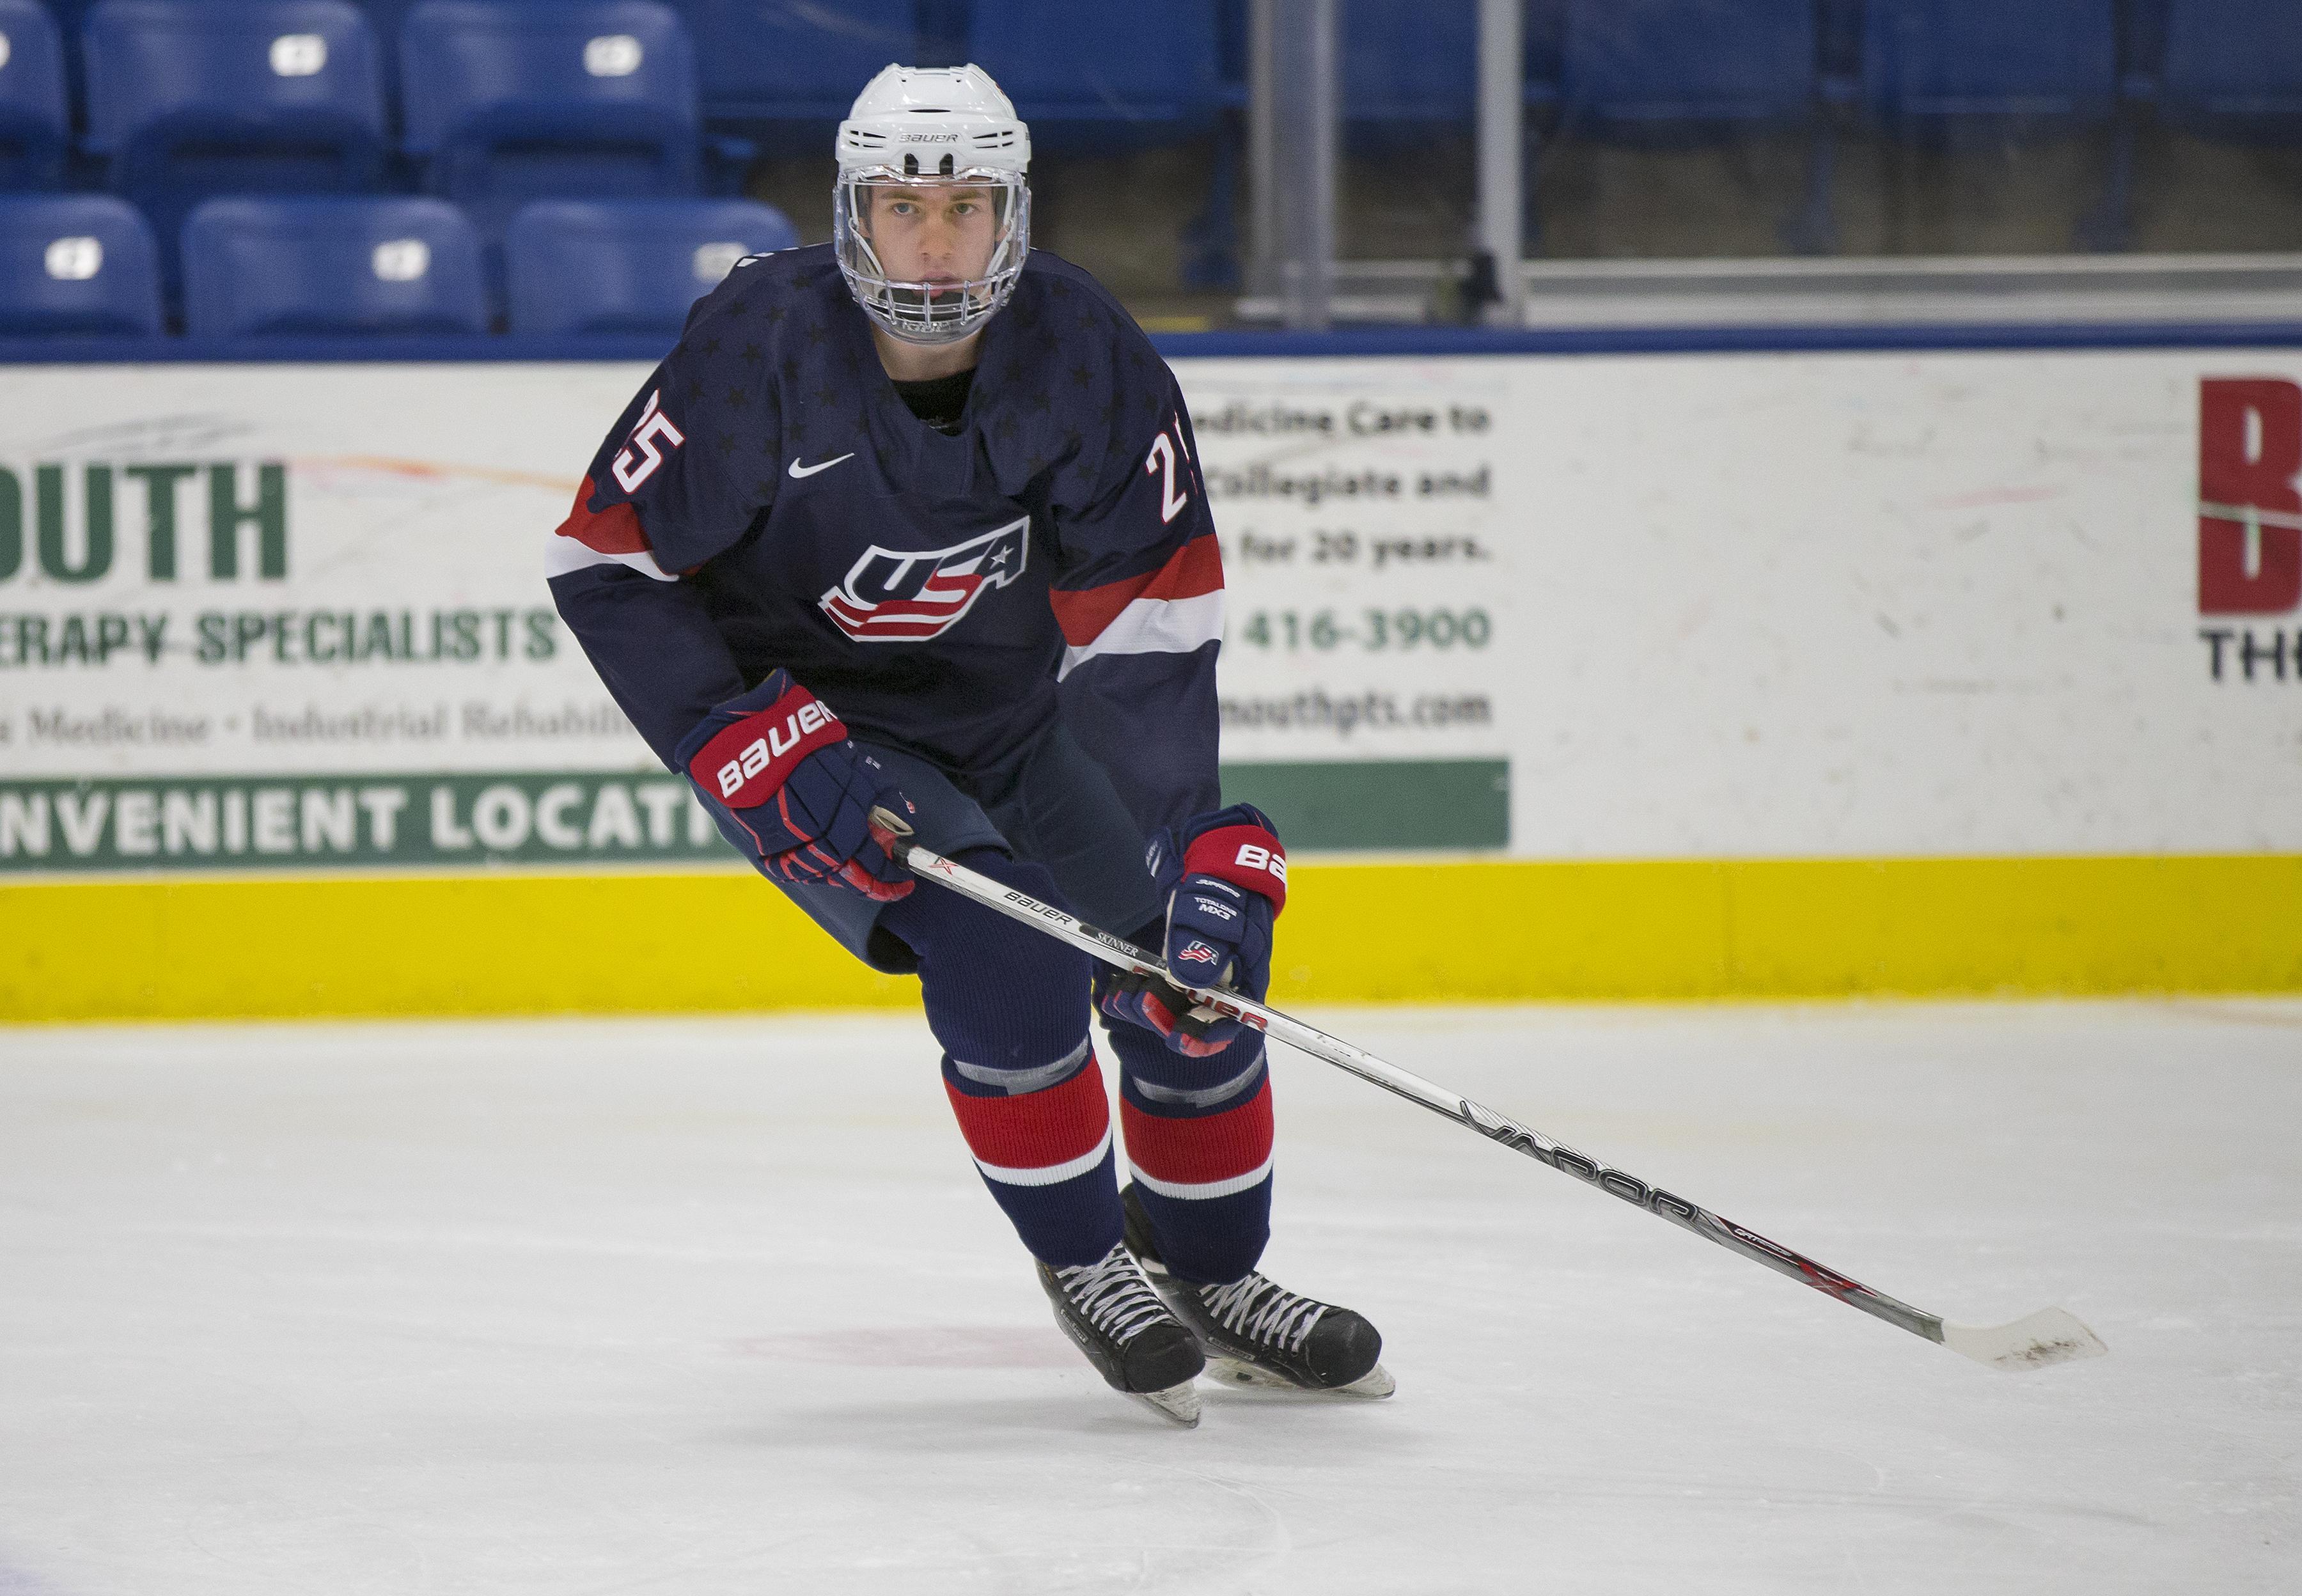 USHL: Brind'Amour Tallies First League Goal; U17s Fall To Bloomington, 3-1